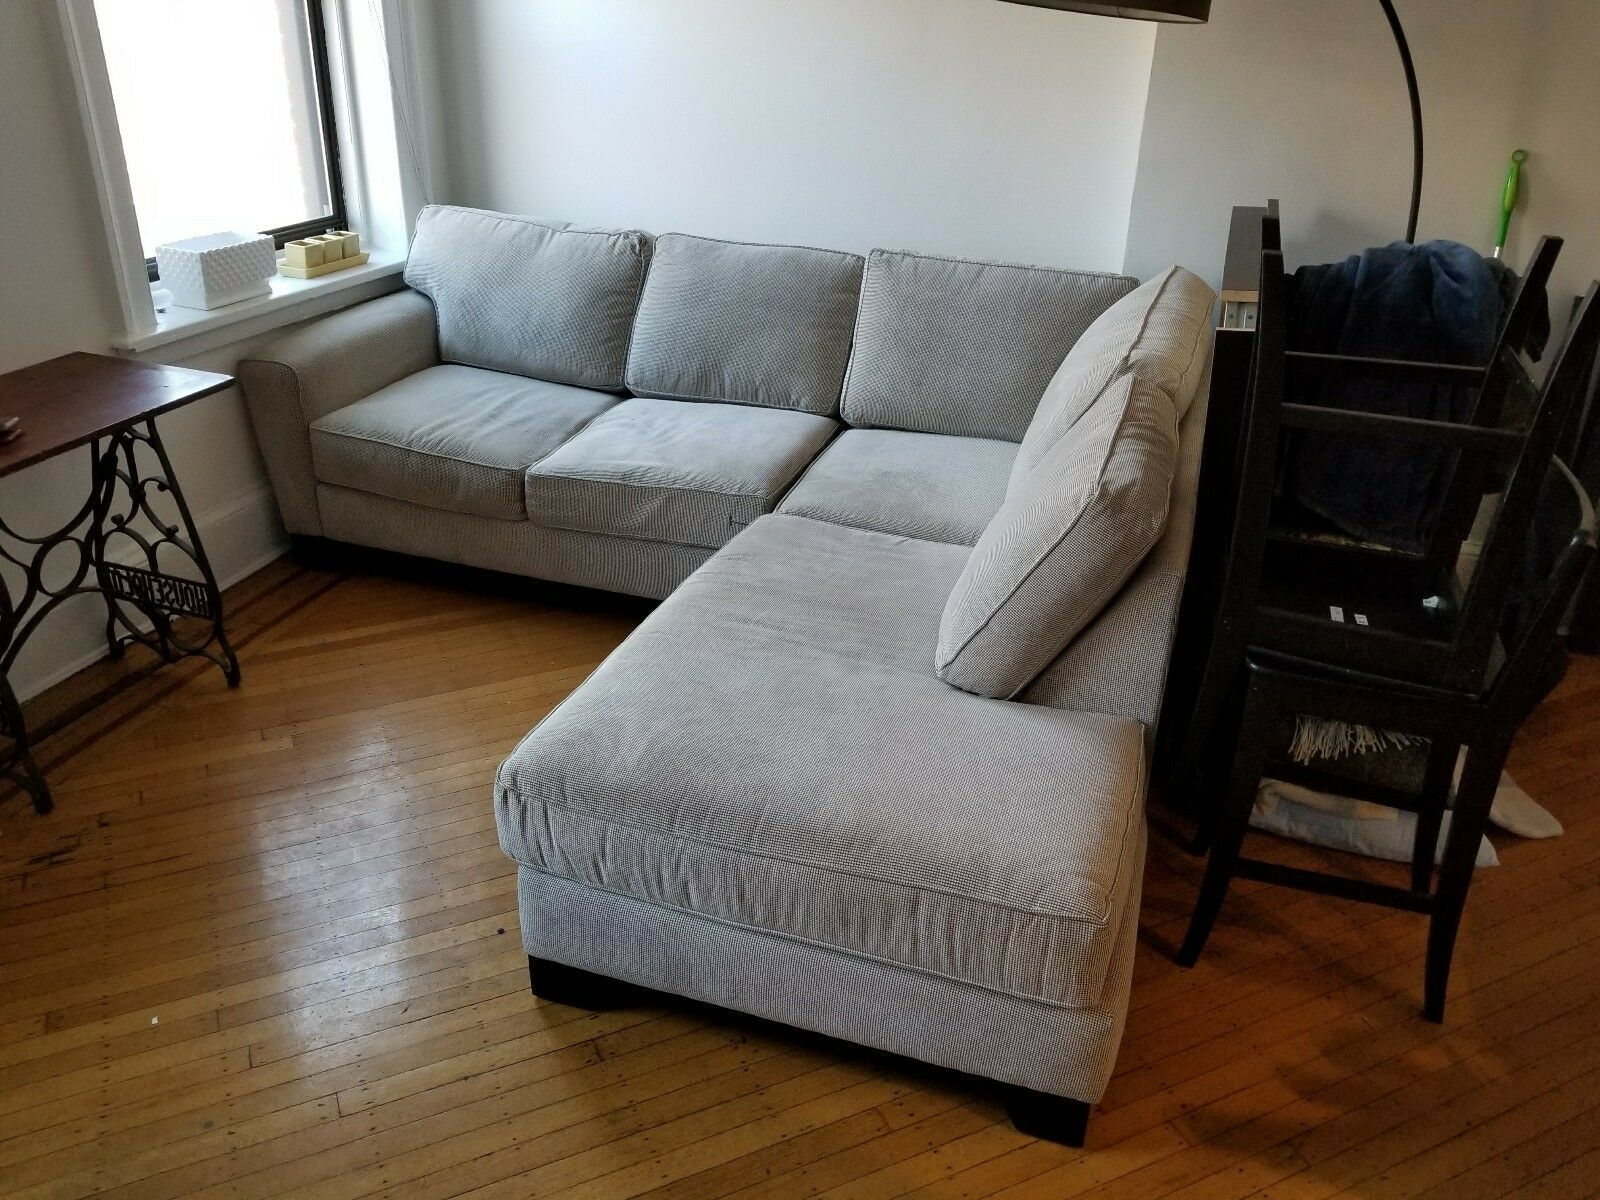 Groovy Modern Fabric Sectional Sofa L Shape Couch Wide Chaise Creativecarmelina Interior Chair Design Creativecarmelinacom